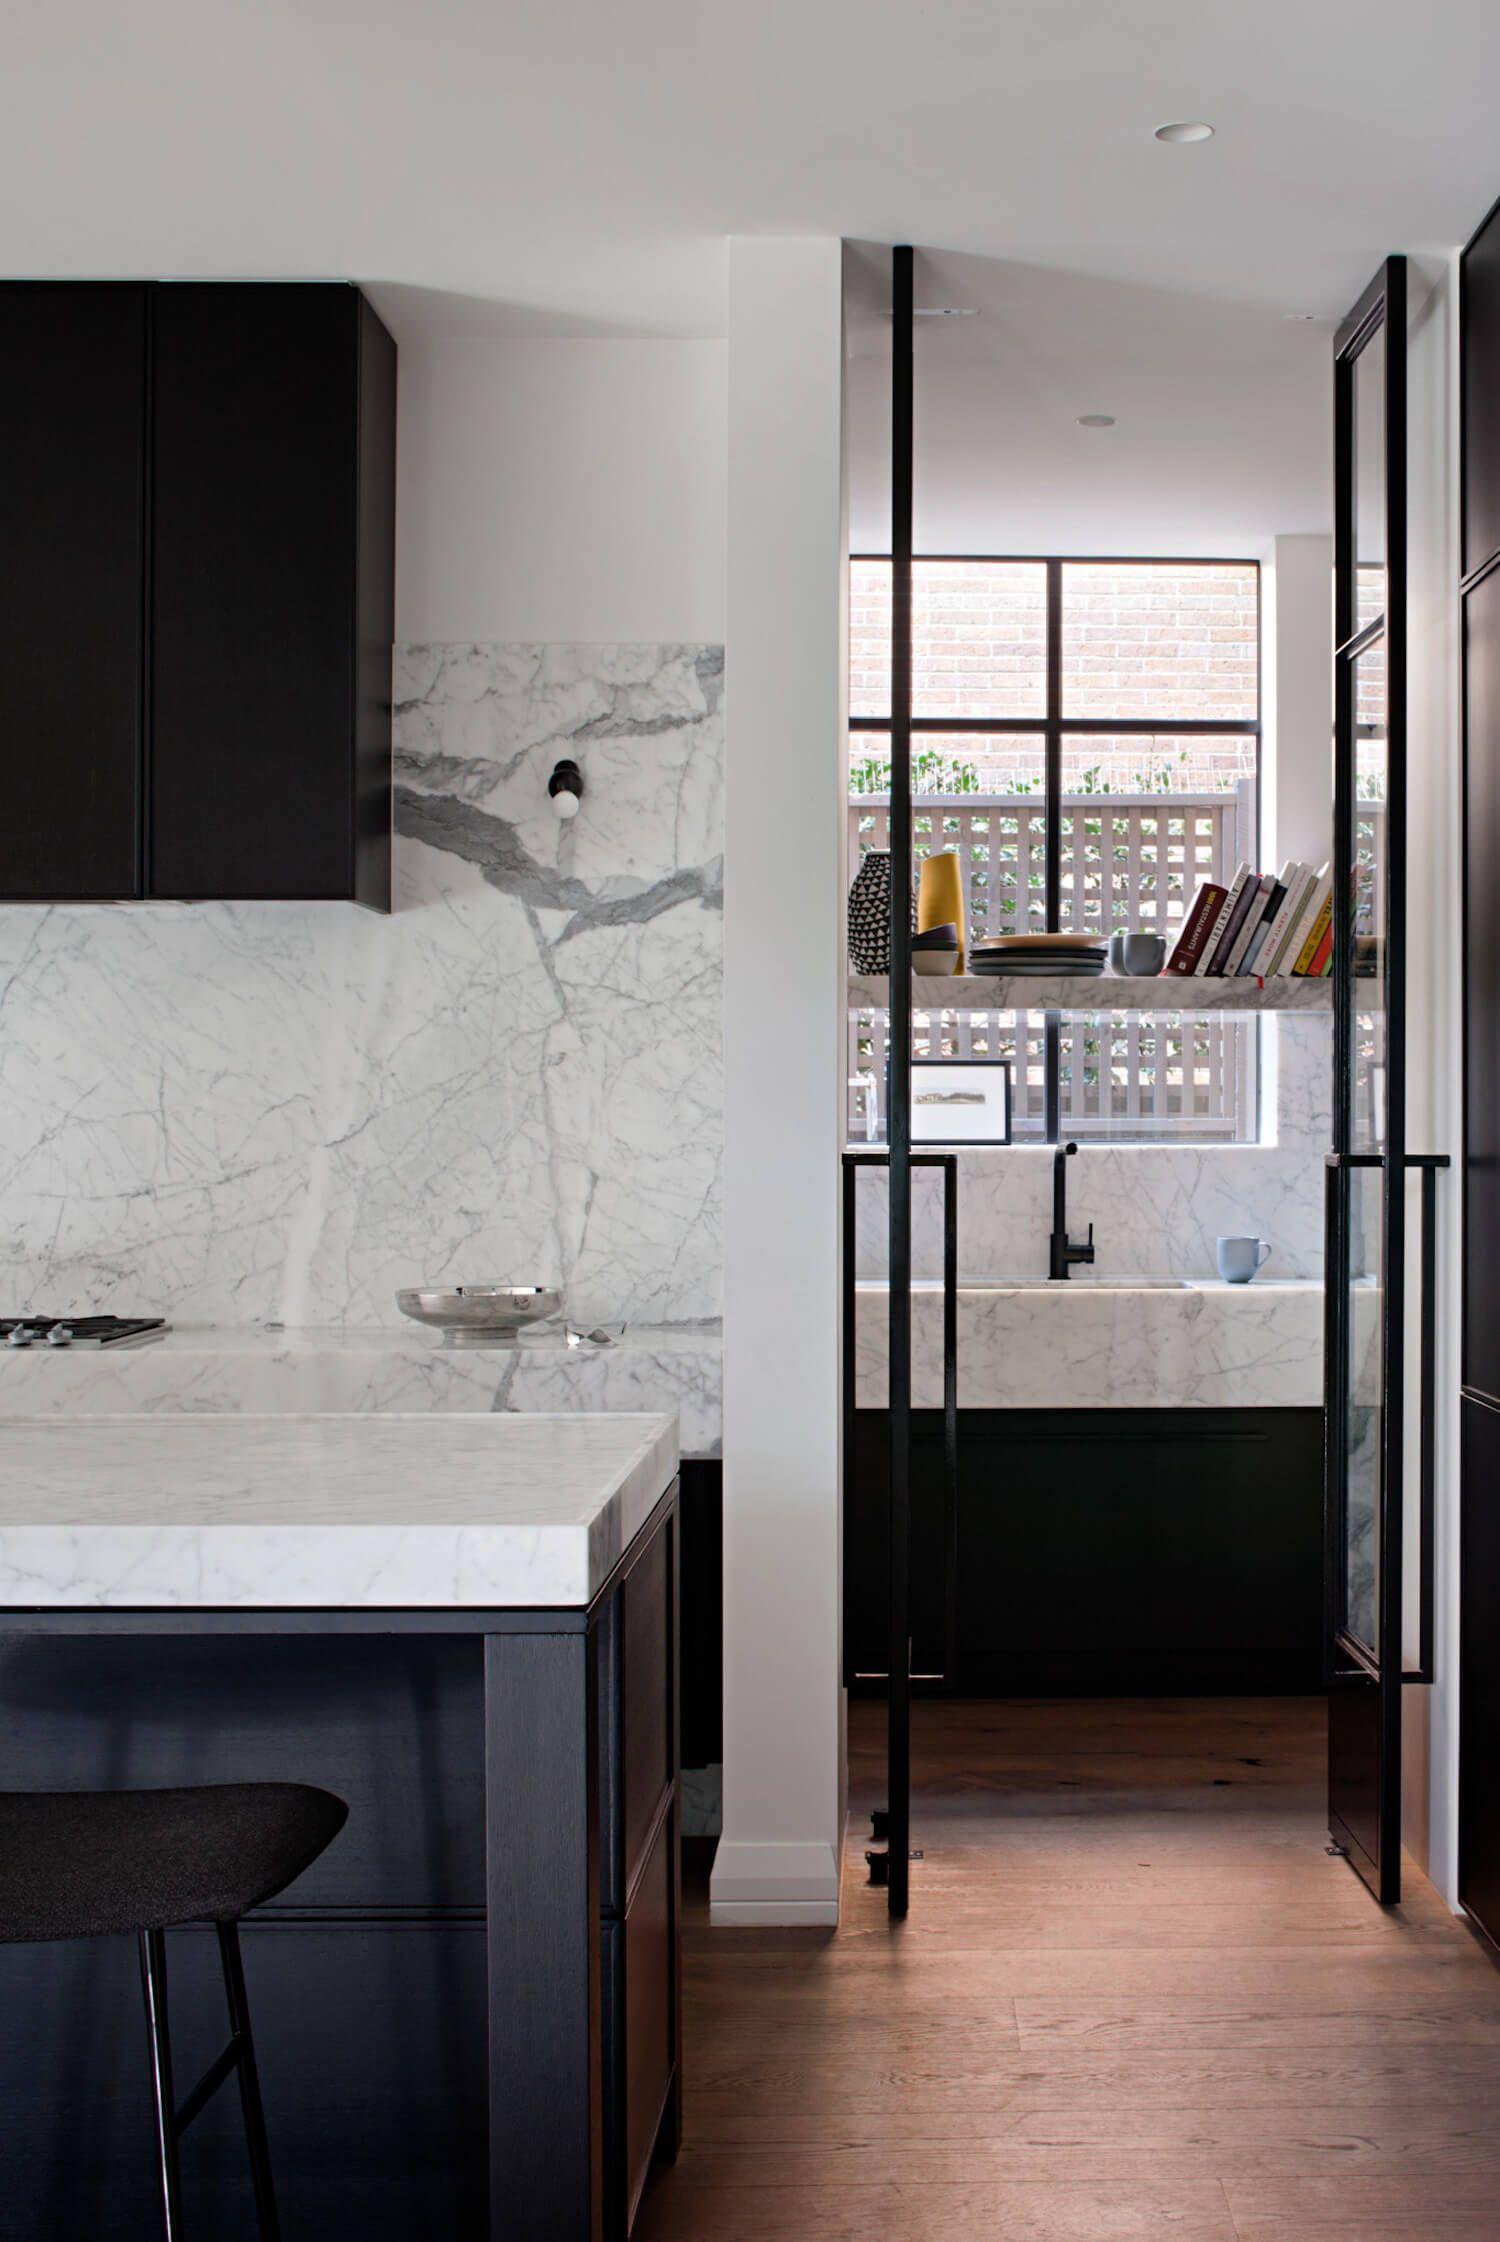 Interior Design Of Kitchen Room: Toorak Residence By Hecker Guthrie